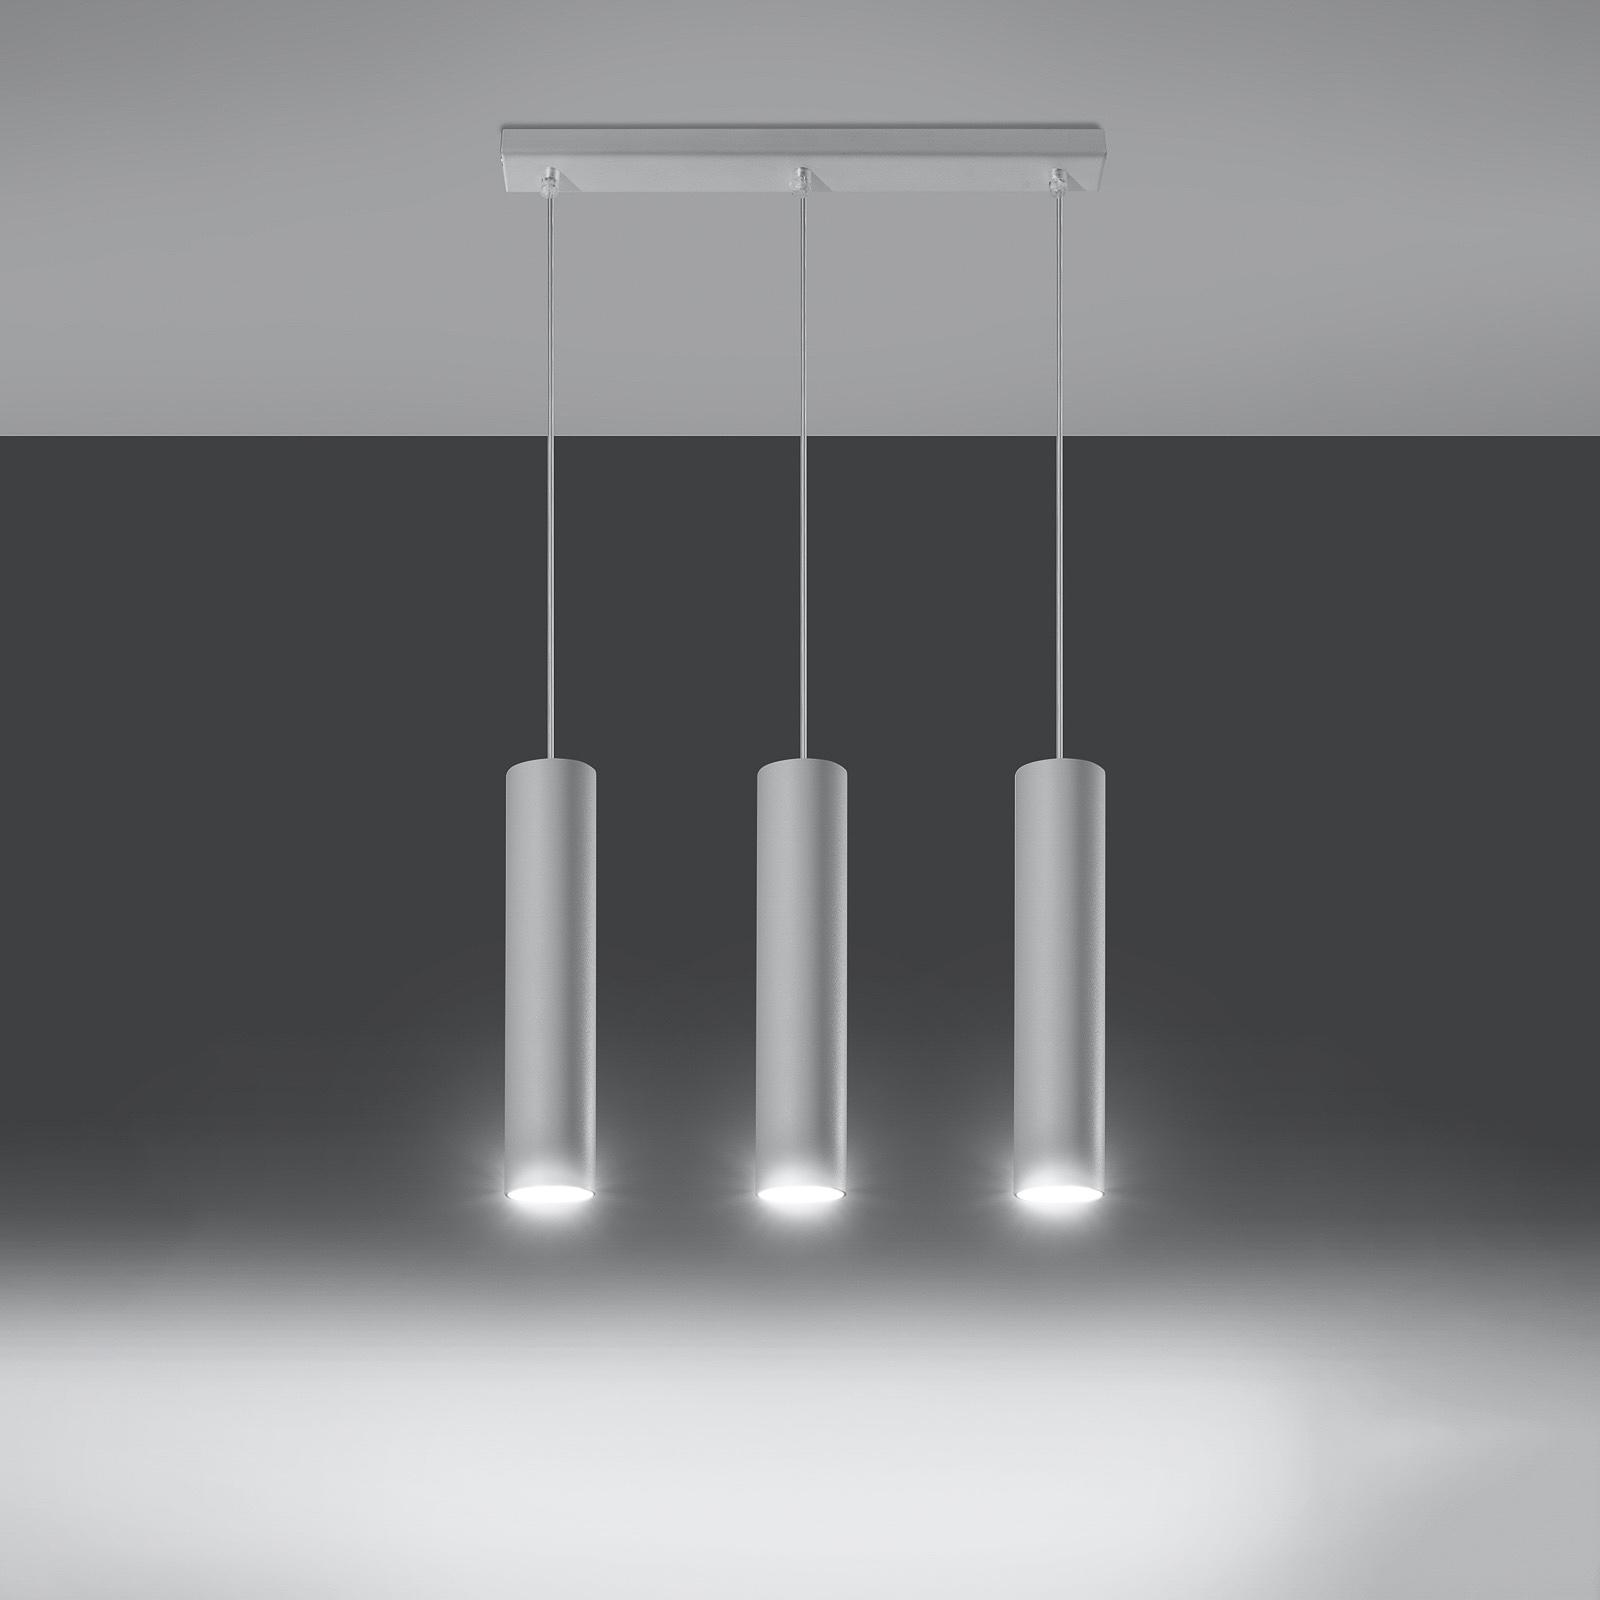 Lampa wisząca Tube, biała, 3-punktowa